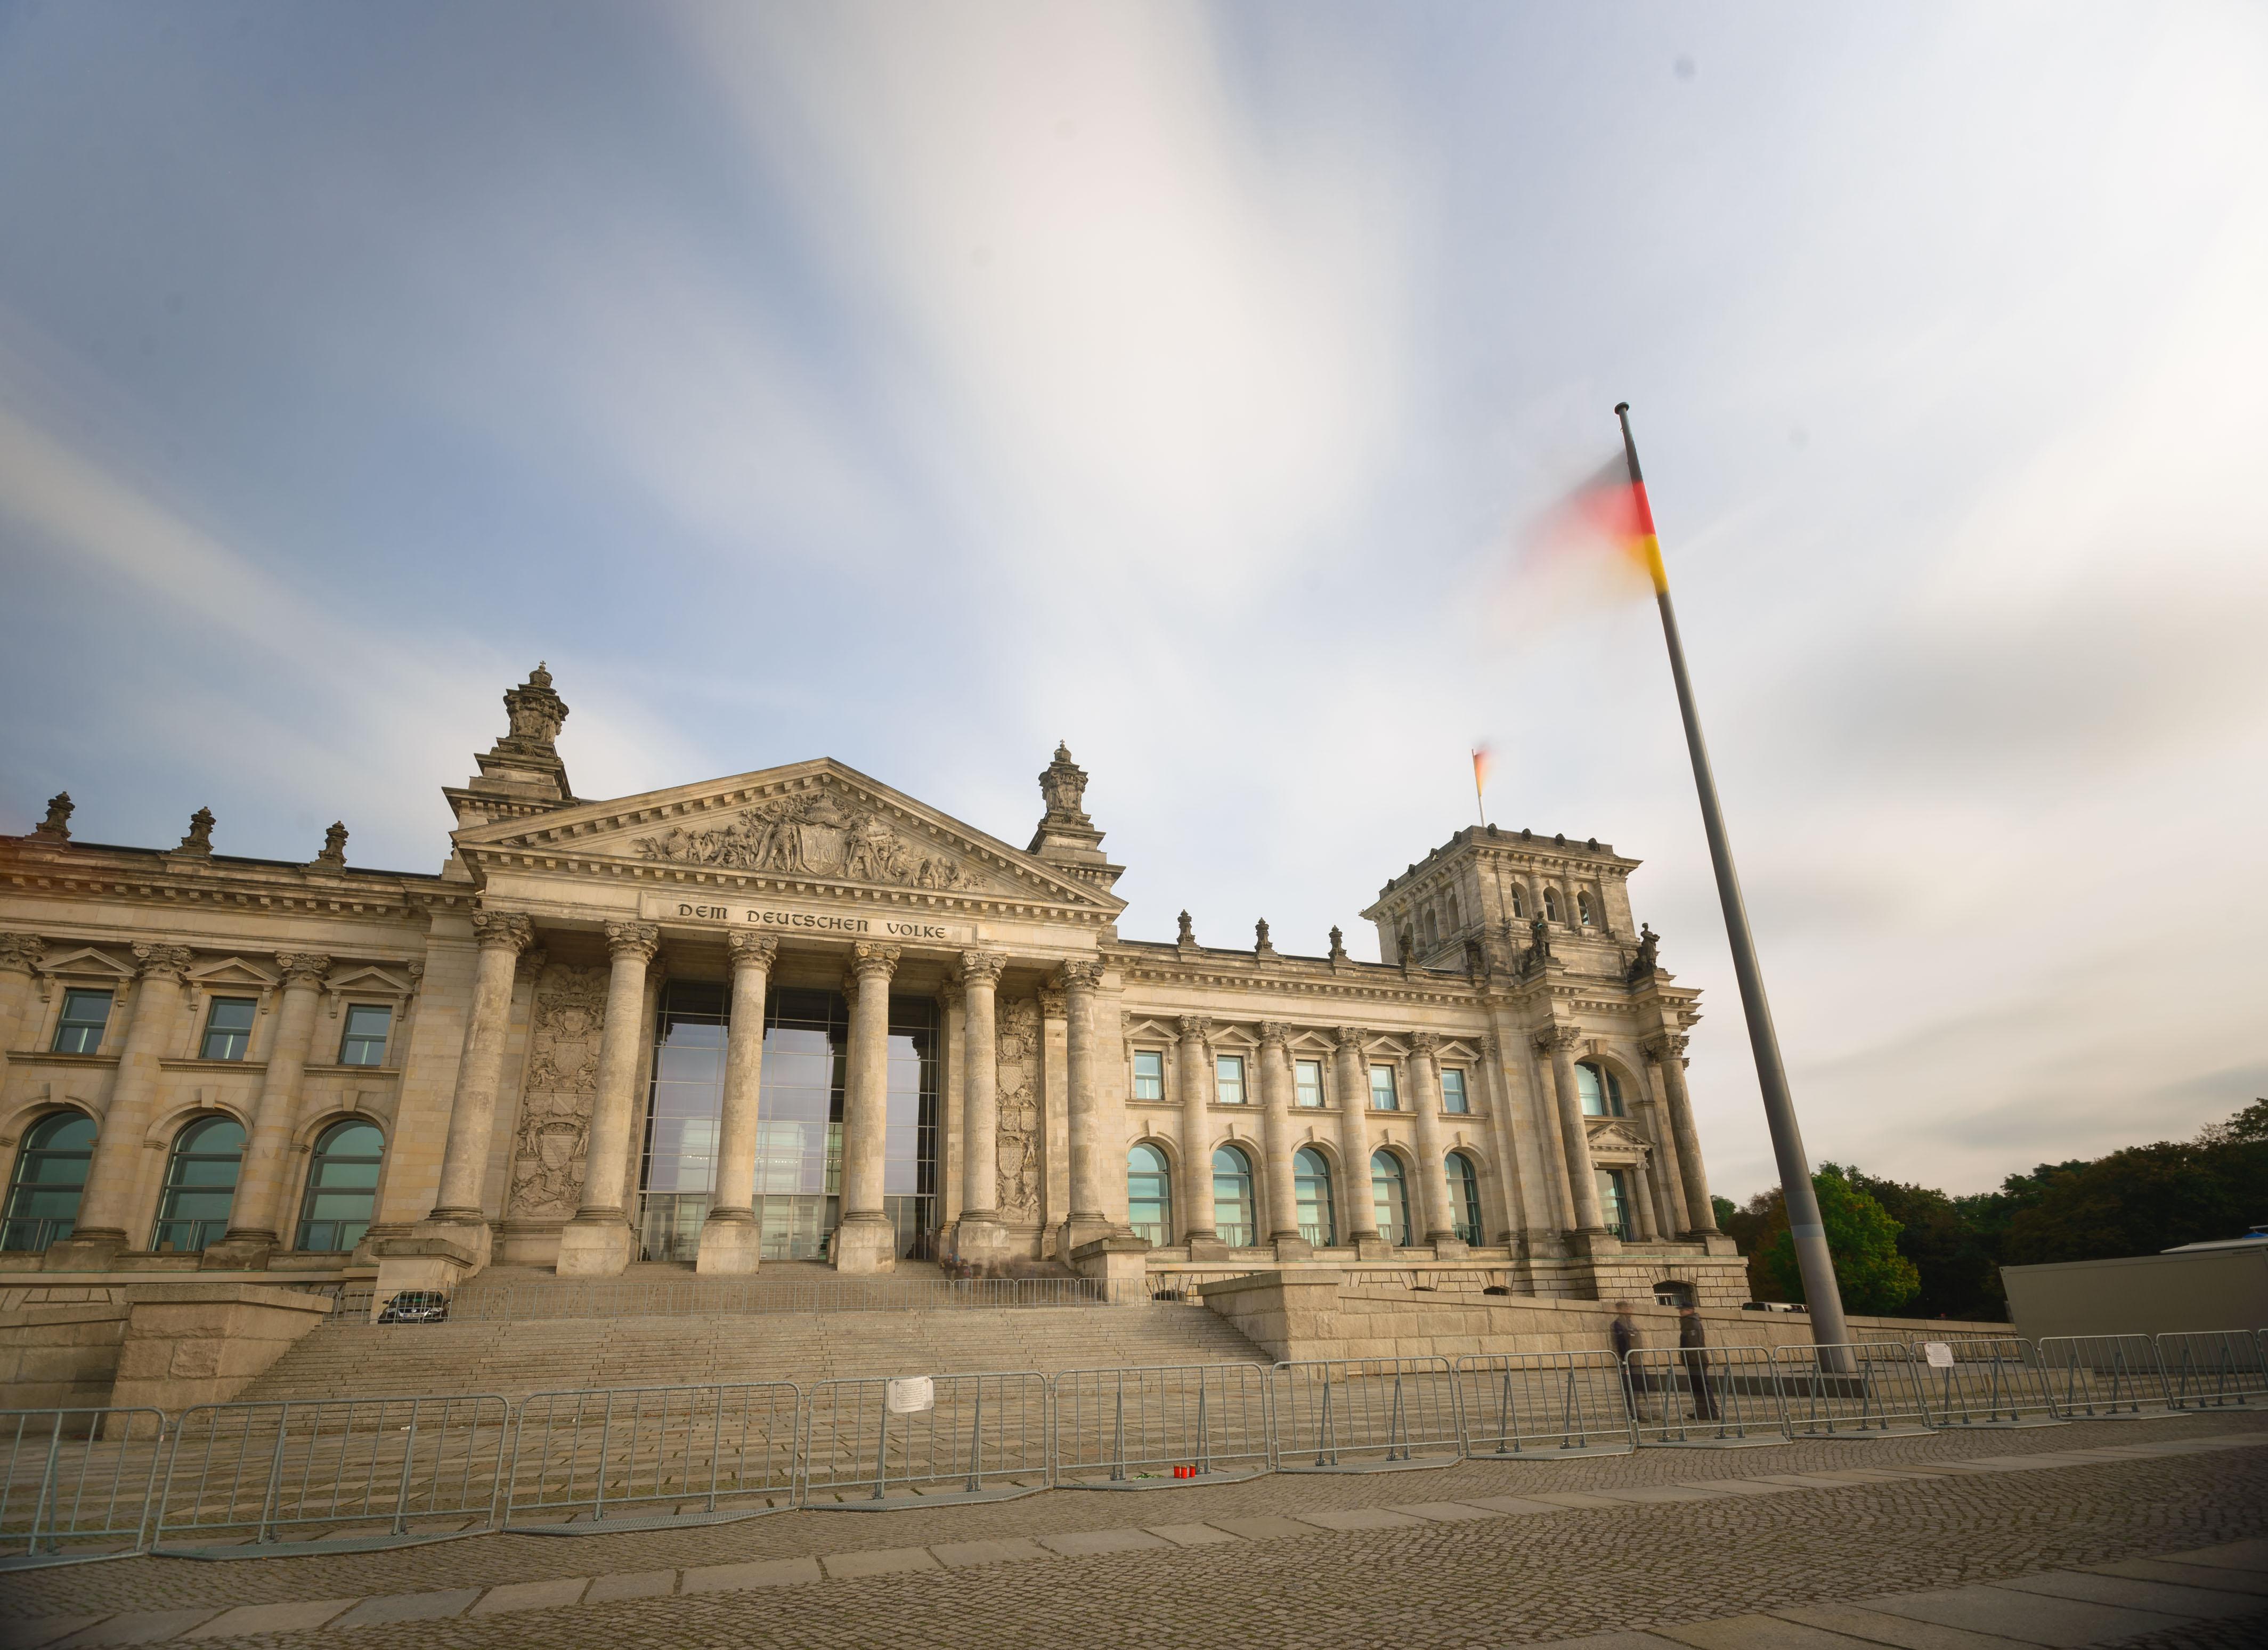 Gratis billeder : arkitektur, struktur, bygning, palads, milepæl, deutschland, berlin, Rigsdagen ...